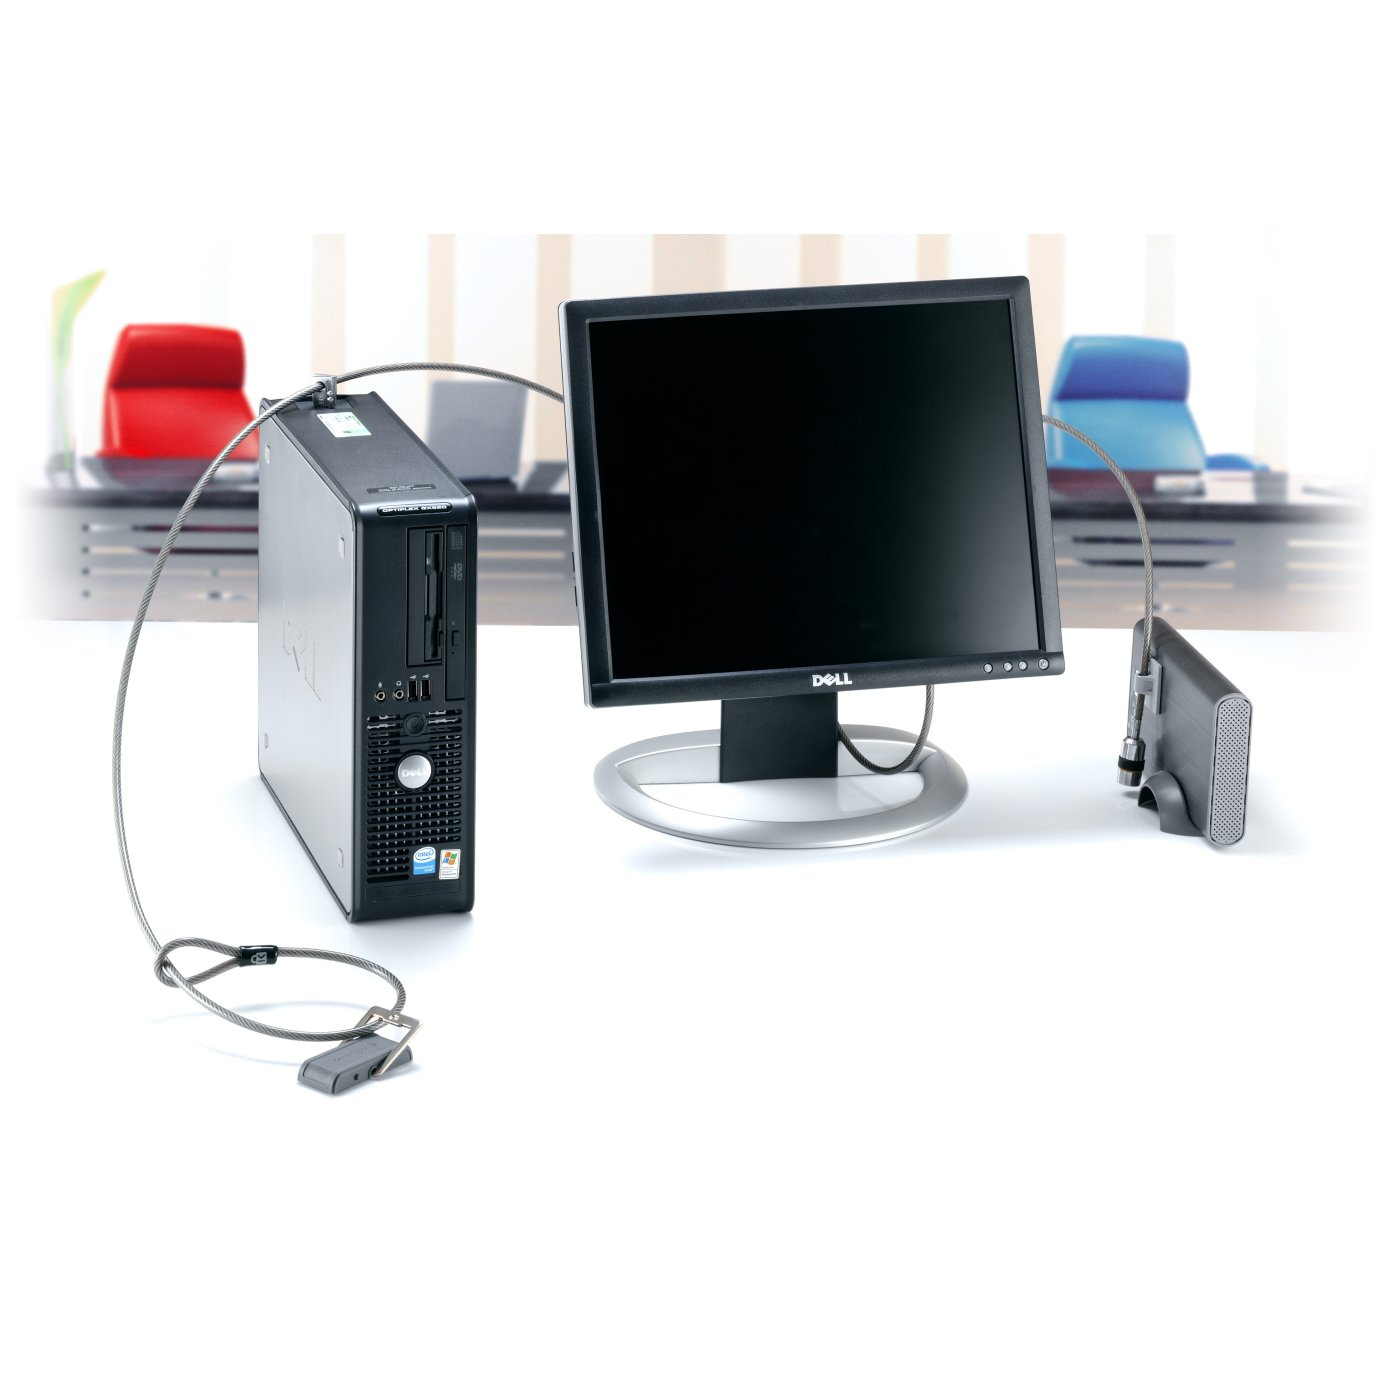 Kensington Desktop Amp Peripherals Locking Kits Custom